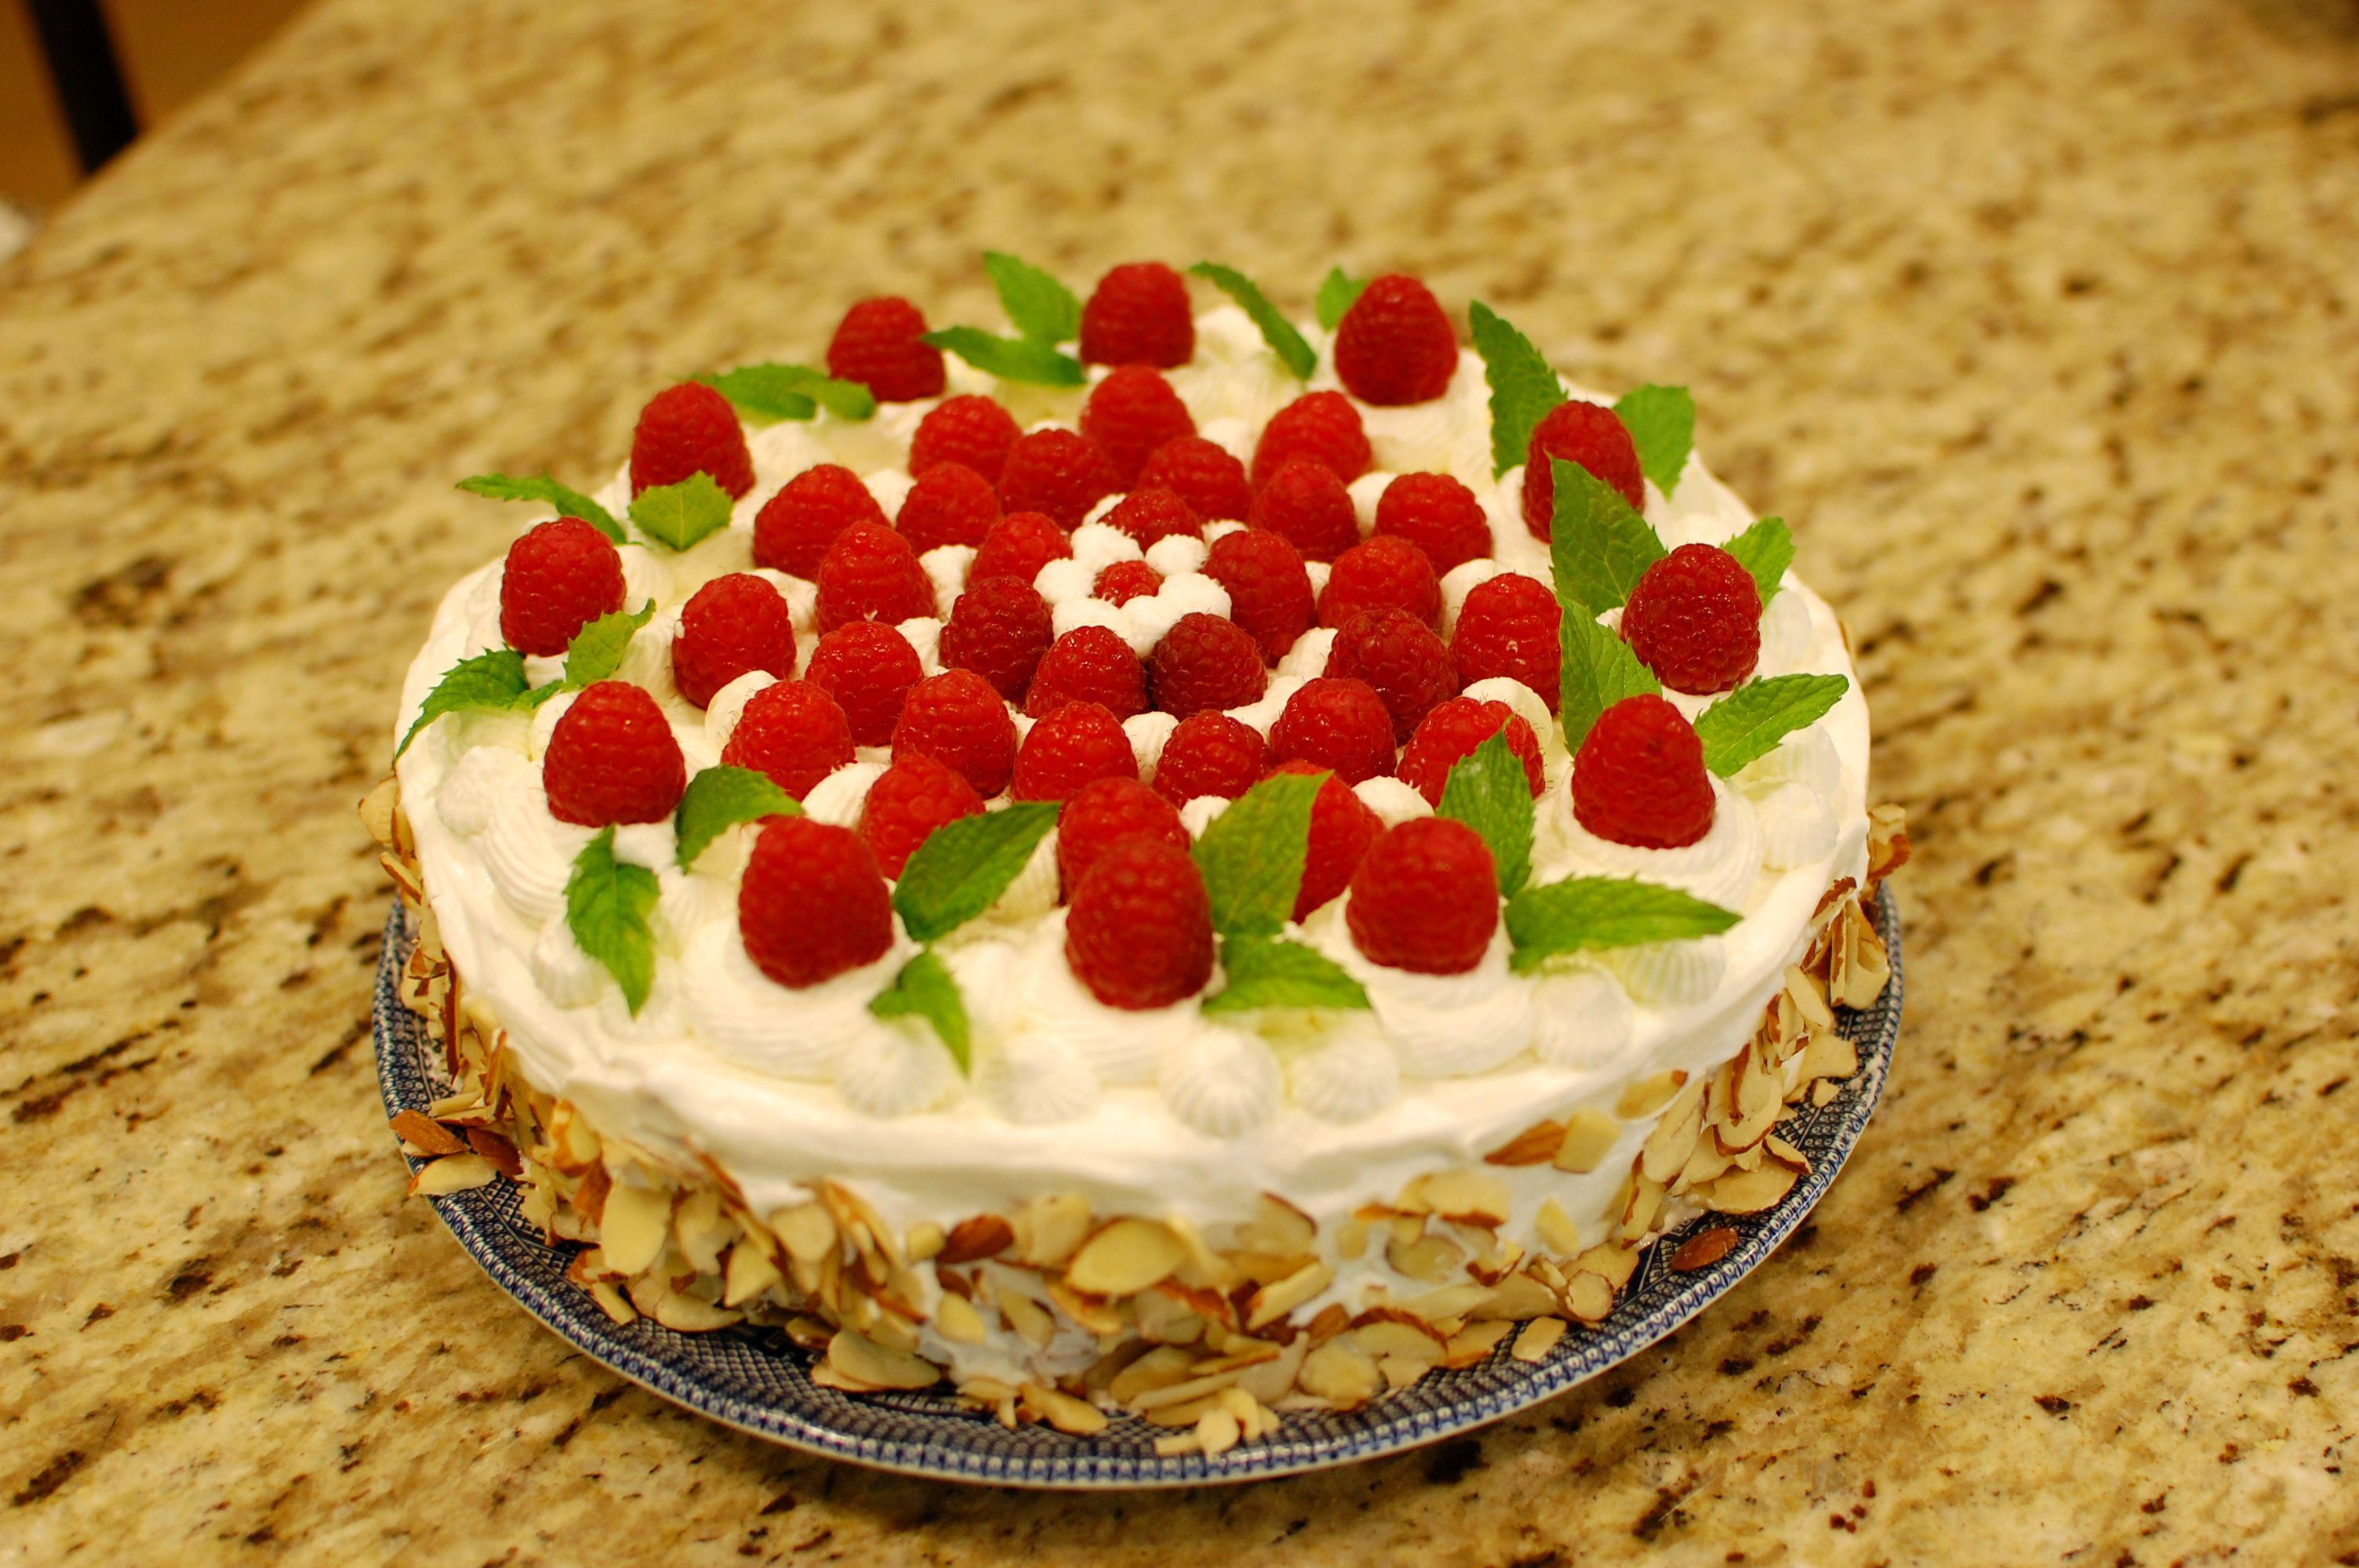 Strawberry Birthday Cake  Japanese Strawberry Cake a k a Chinese Birthday Cake